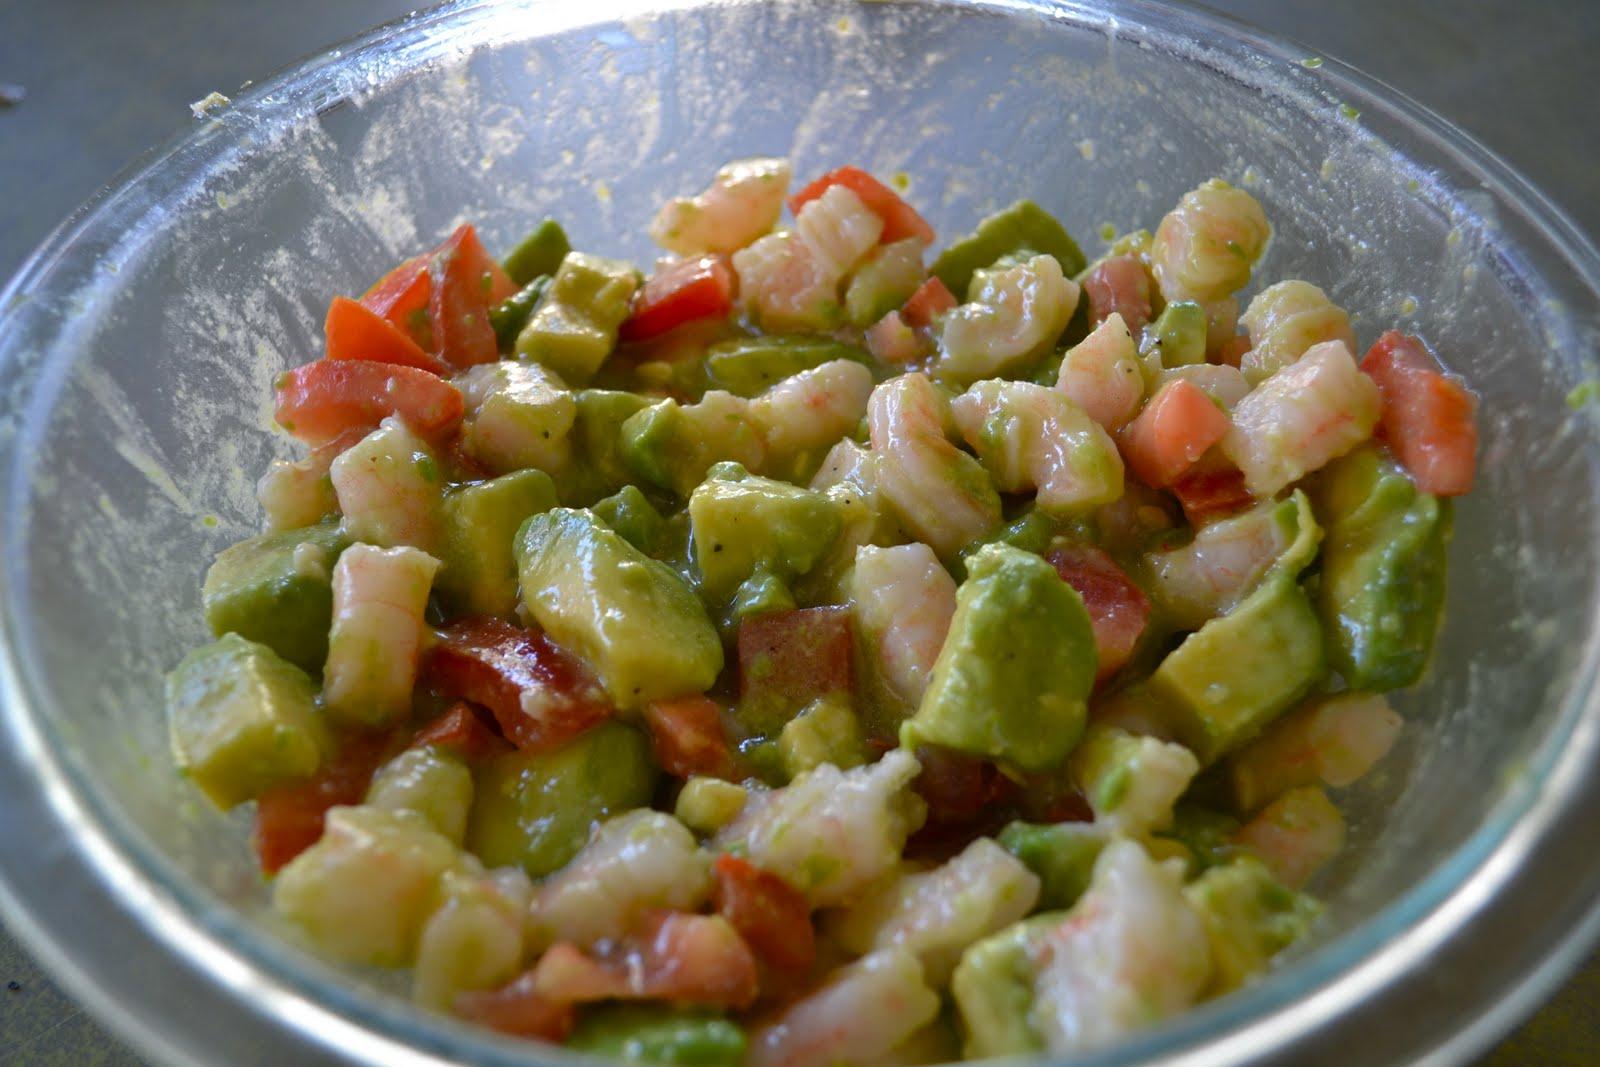 Eat Your Veggies, Peas: ZESTY LIME SHRIMP AND AVOCADO SALAD